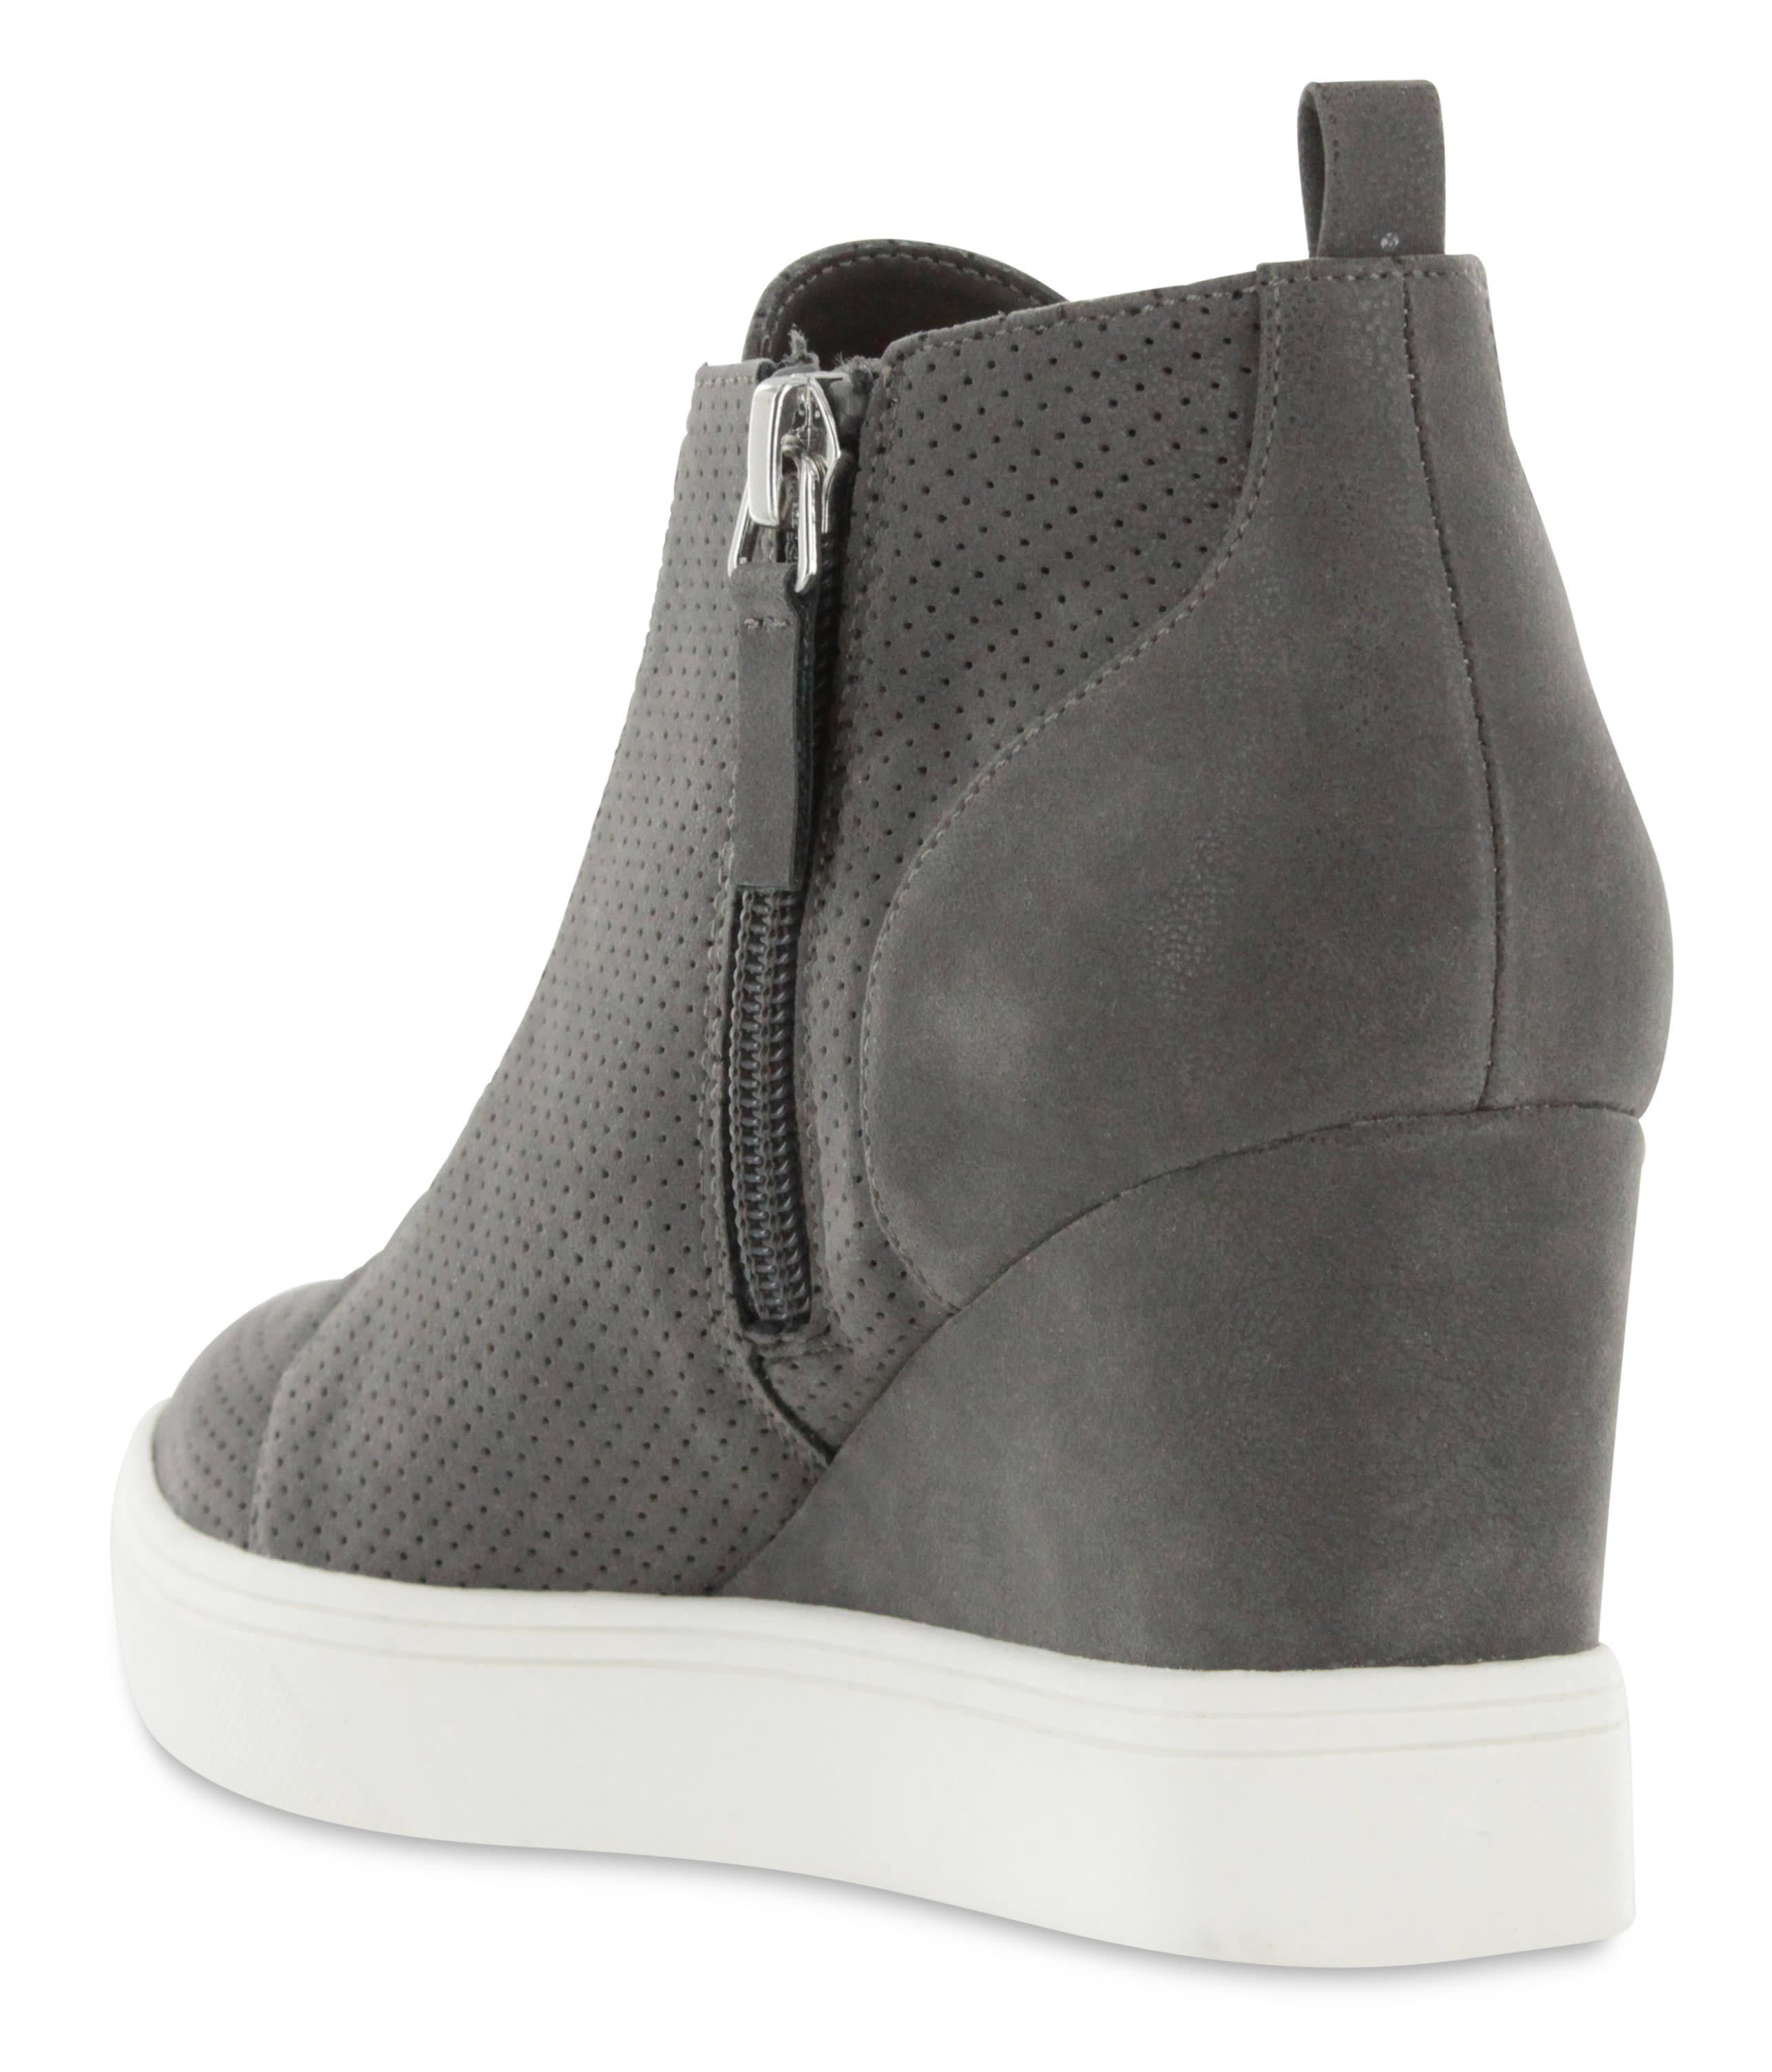 Mia Cristie Wedge Sneaker - grey - Detail